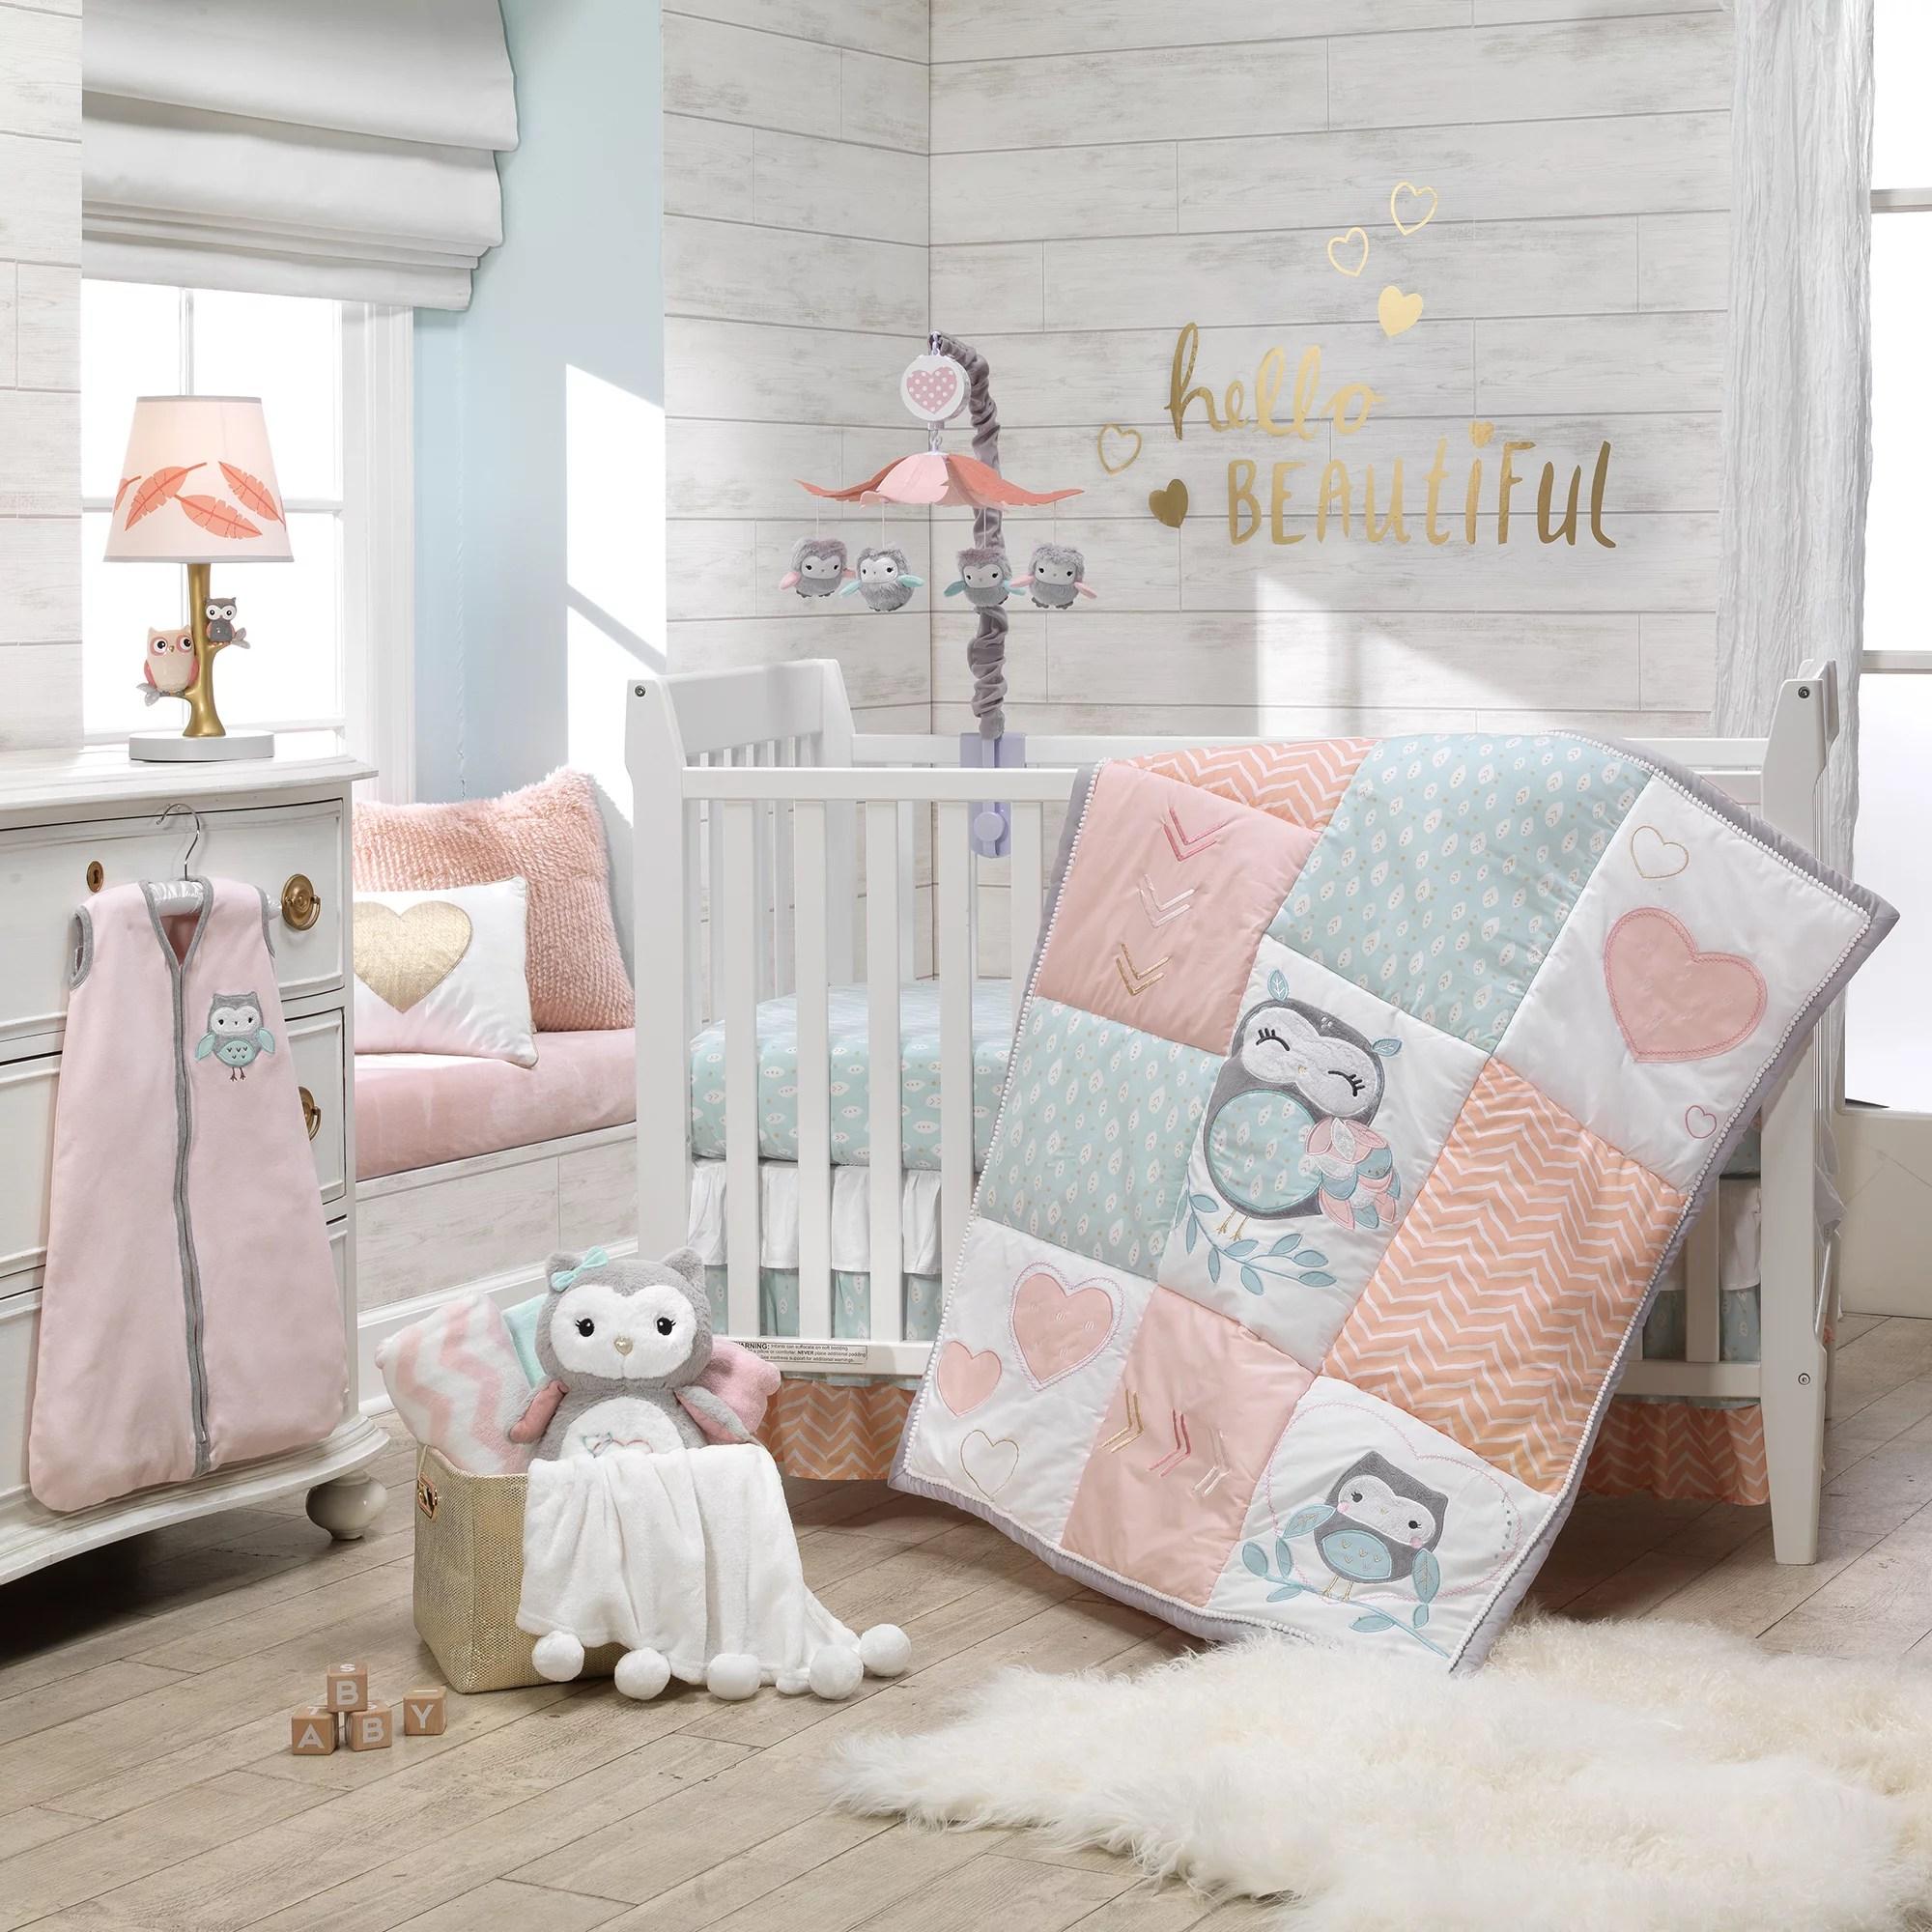 lambs ivy sweet owl dreams pink heart nursery 6 piece baby crib bedding set